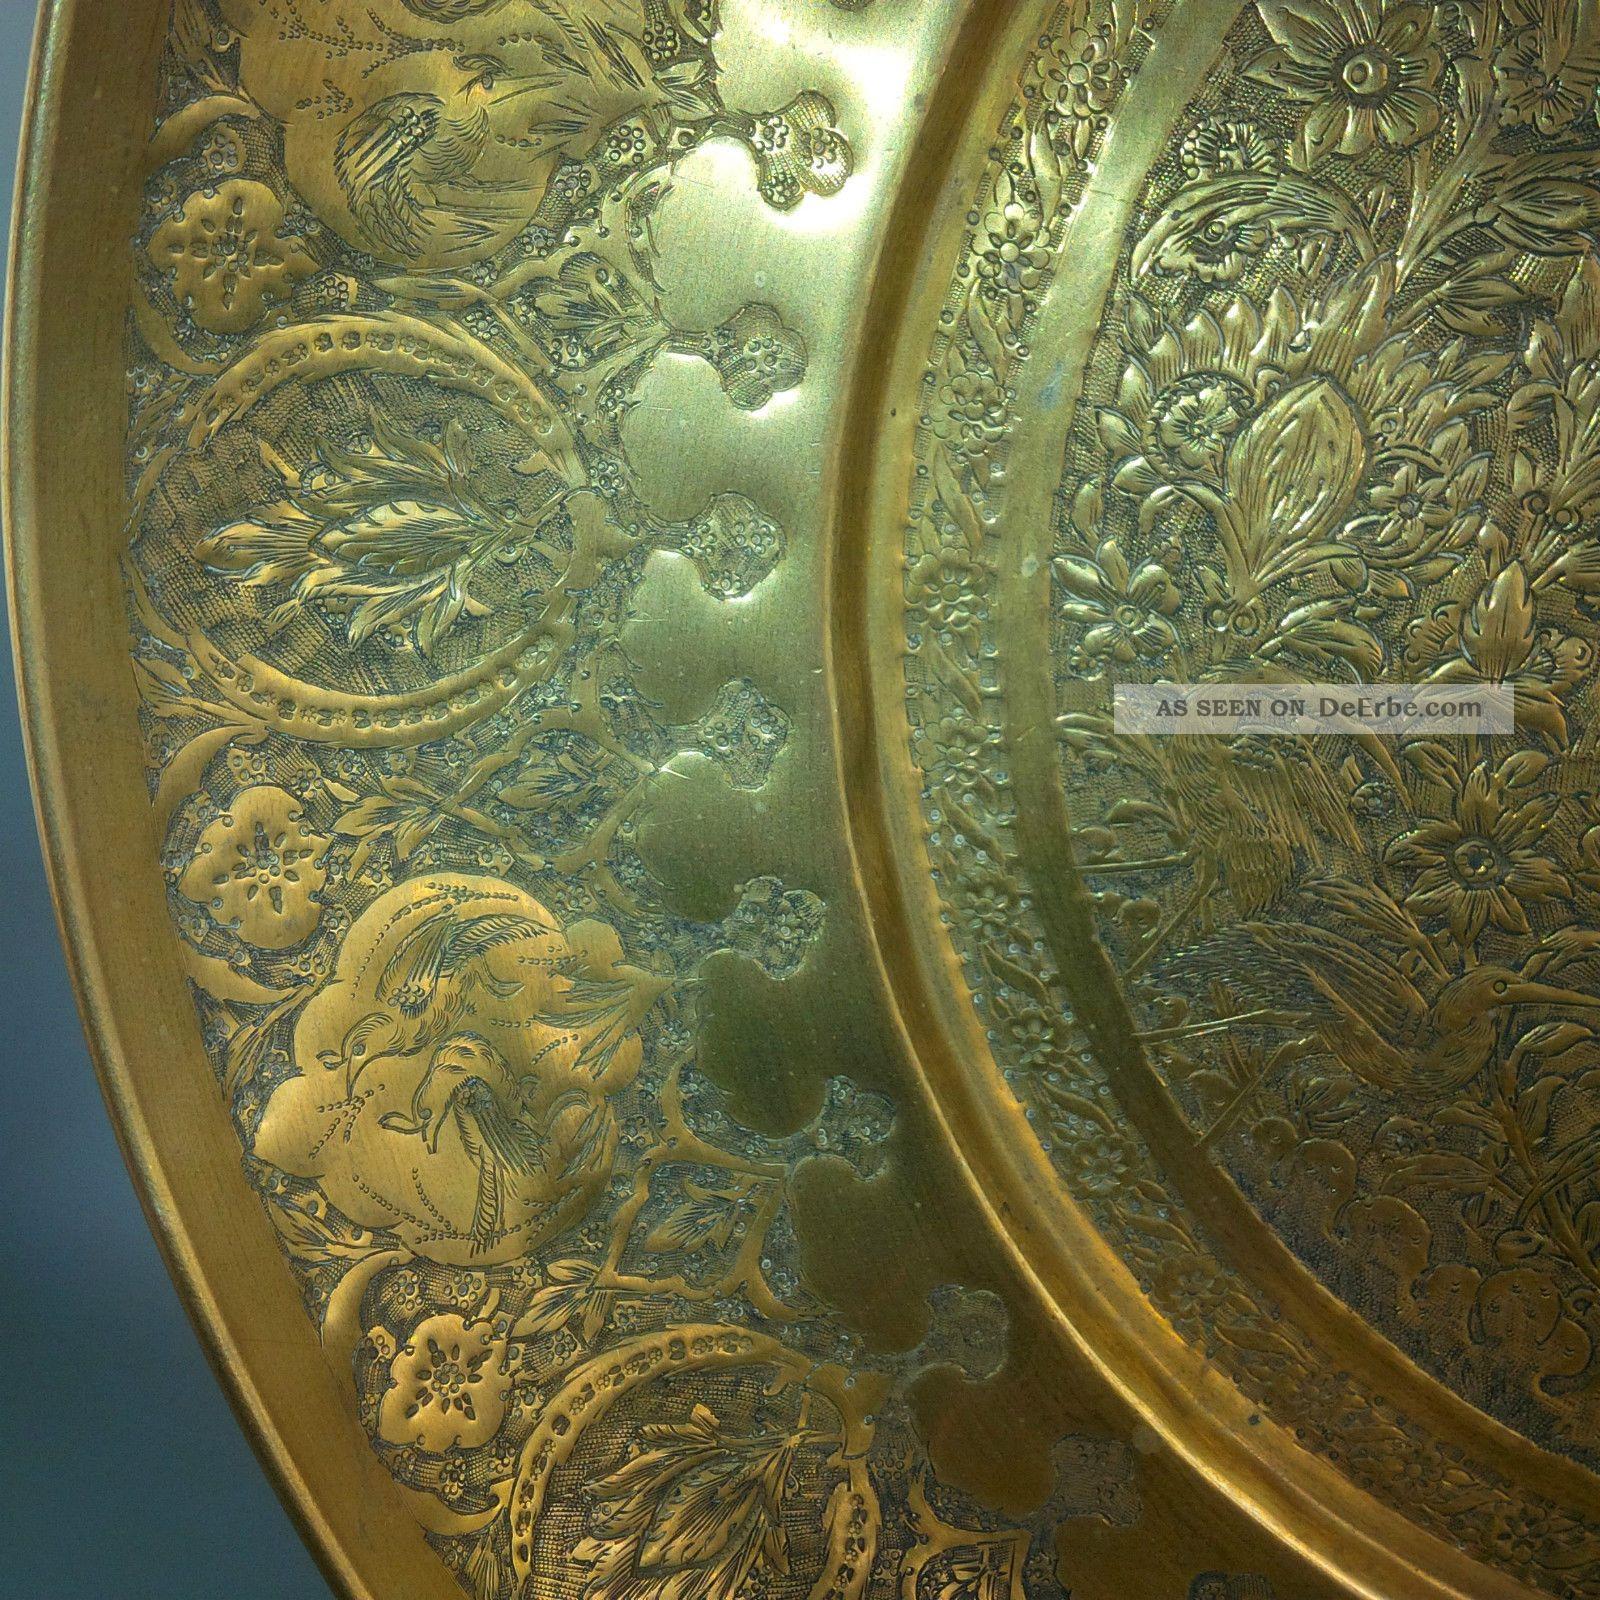 antike messing schale ziseliert persien islamische kunst um 1900 wandteller gold. Black Bedroom Furniture Sets. Home Design Ideas